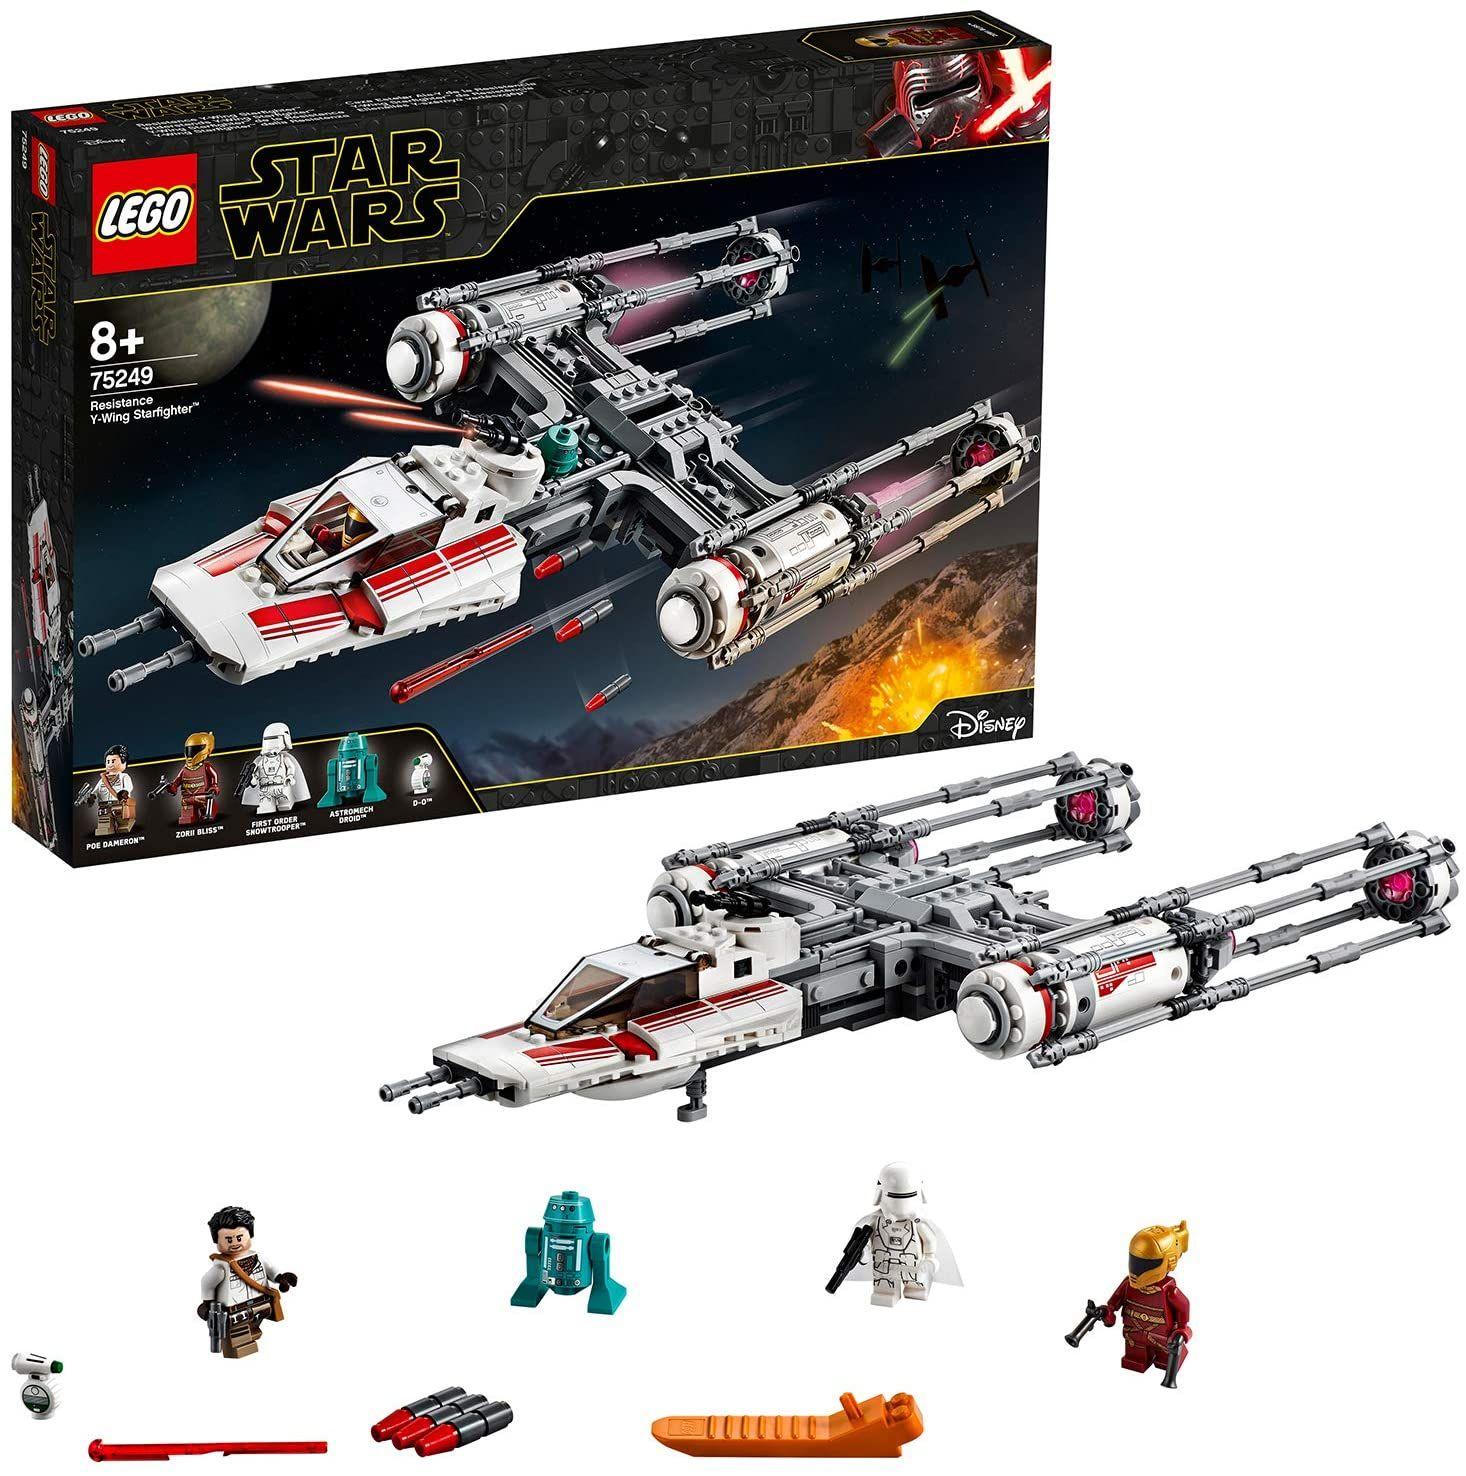 LEGO 75249 Star Wars Widerstands Y-Wing Starfighter Bauset - 578 Teile